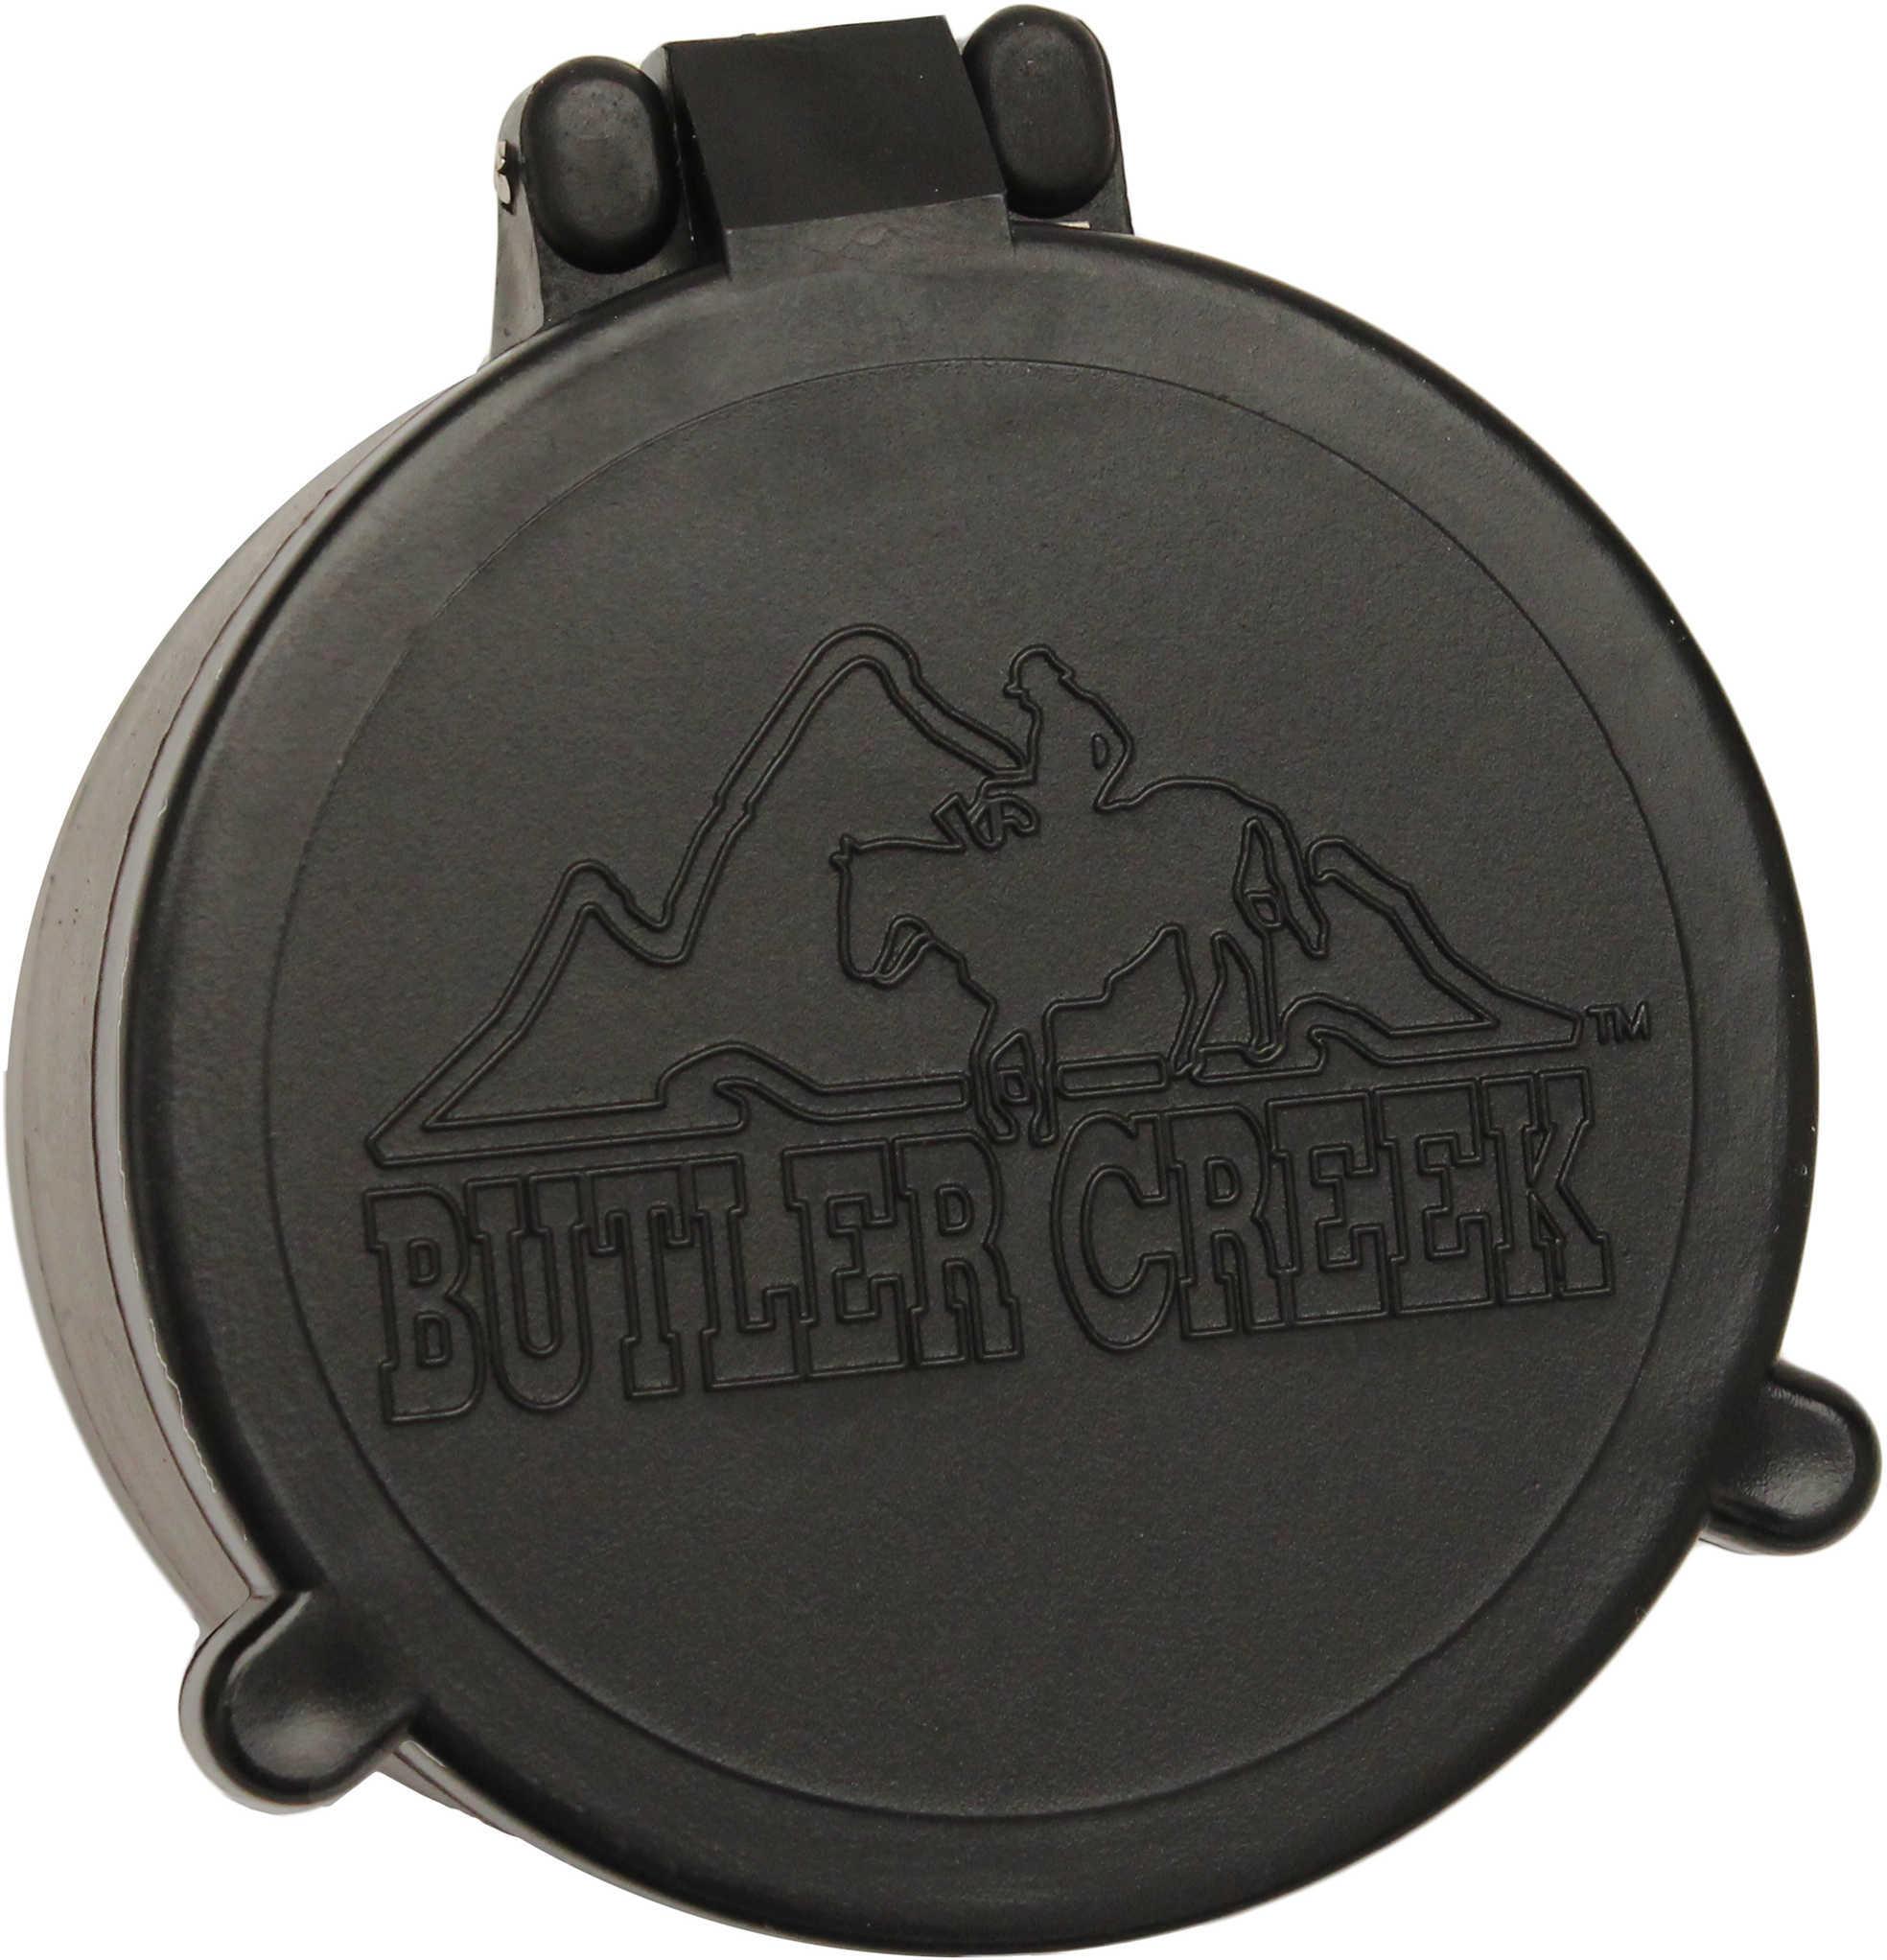 Butler Creek Flip Open Scope Cover - Objective Size 09 Md: 30090